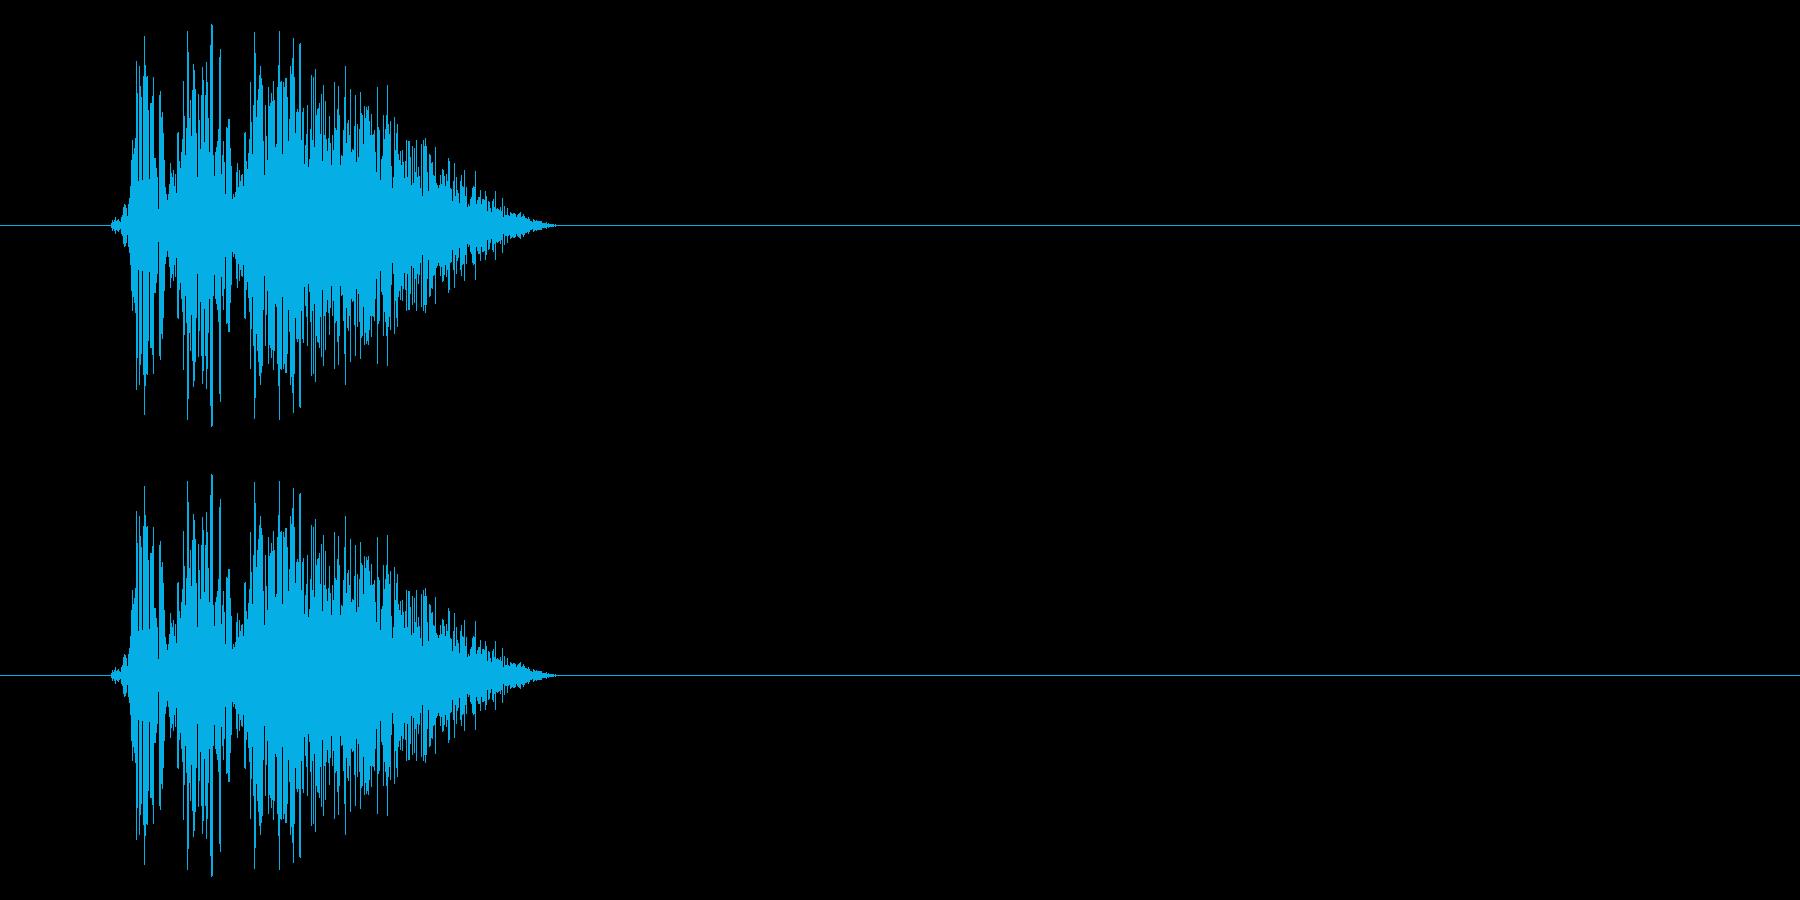 SNES 格闘06-03(ヒット)の再生済みの波形